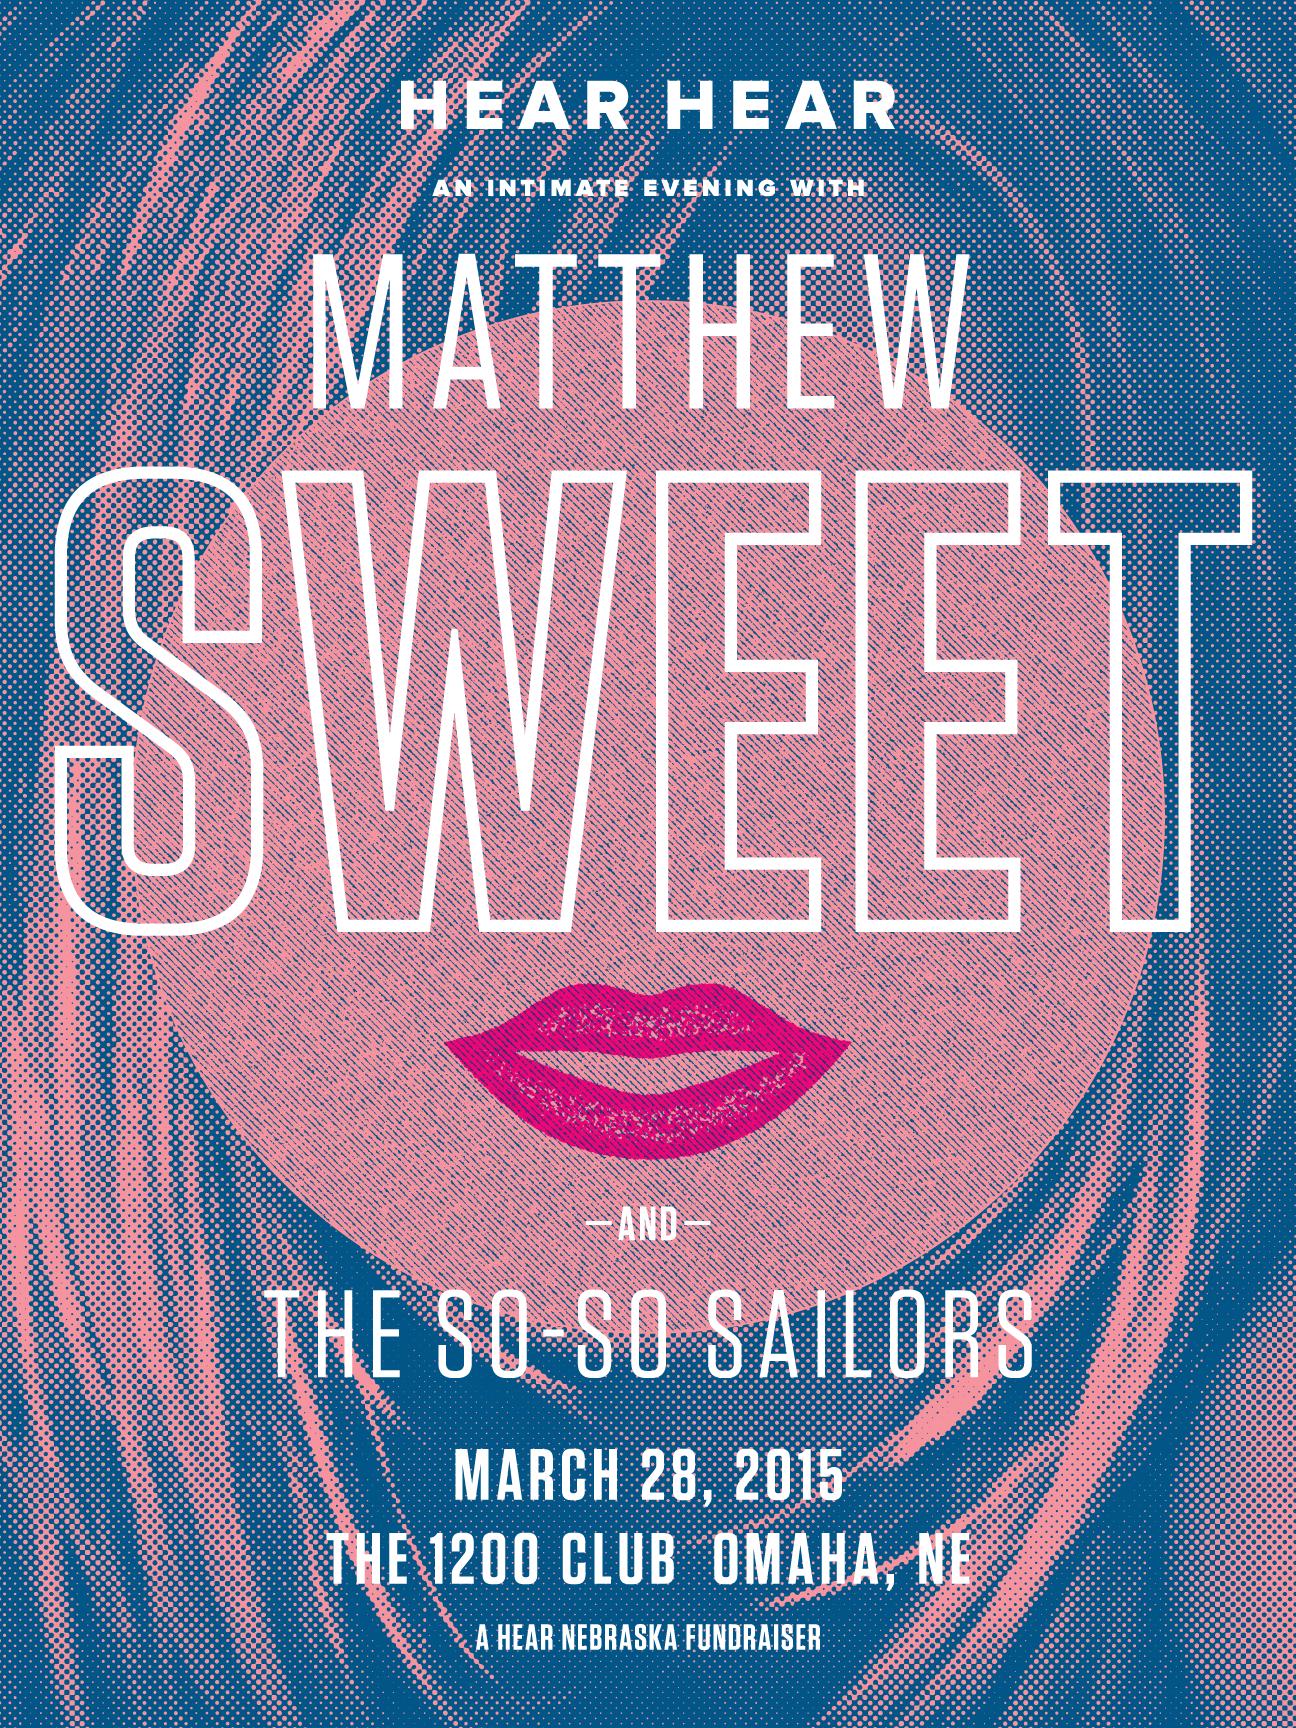 Matthew Sweet: Hear Nebraska Fundraiser 2015